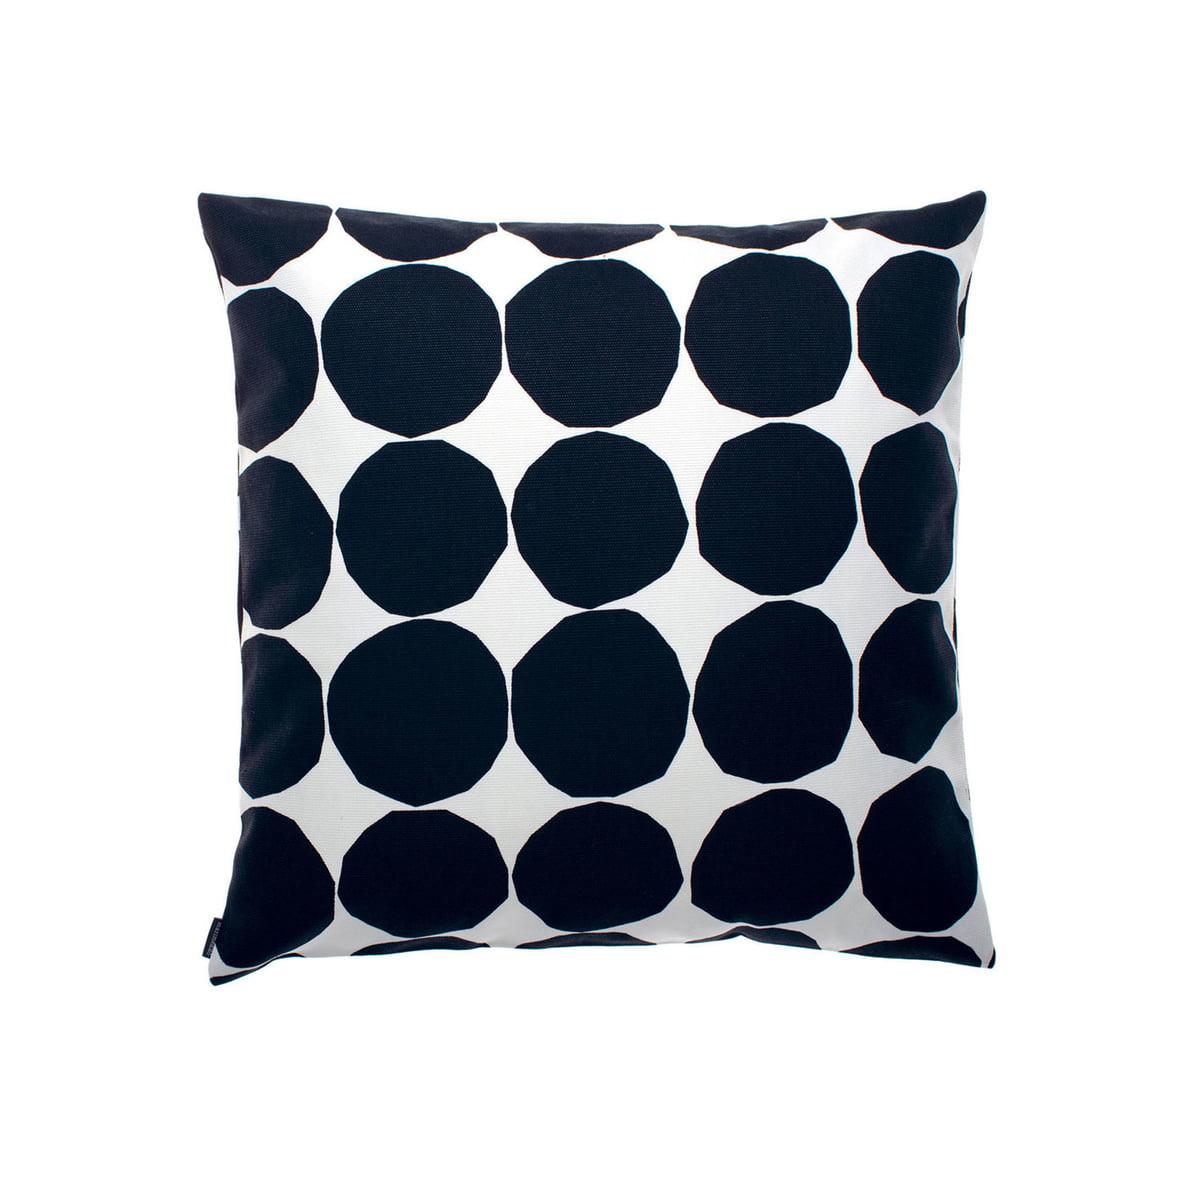 sofa kissenbezge 50x50 excellent herrlich kissen bezug. Black Bedroom Furniture Sets. Home Design Ideas